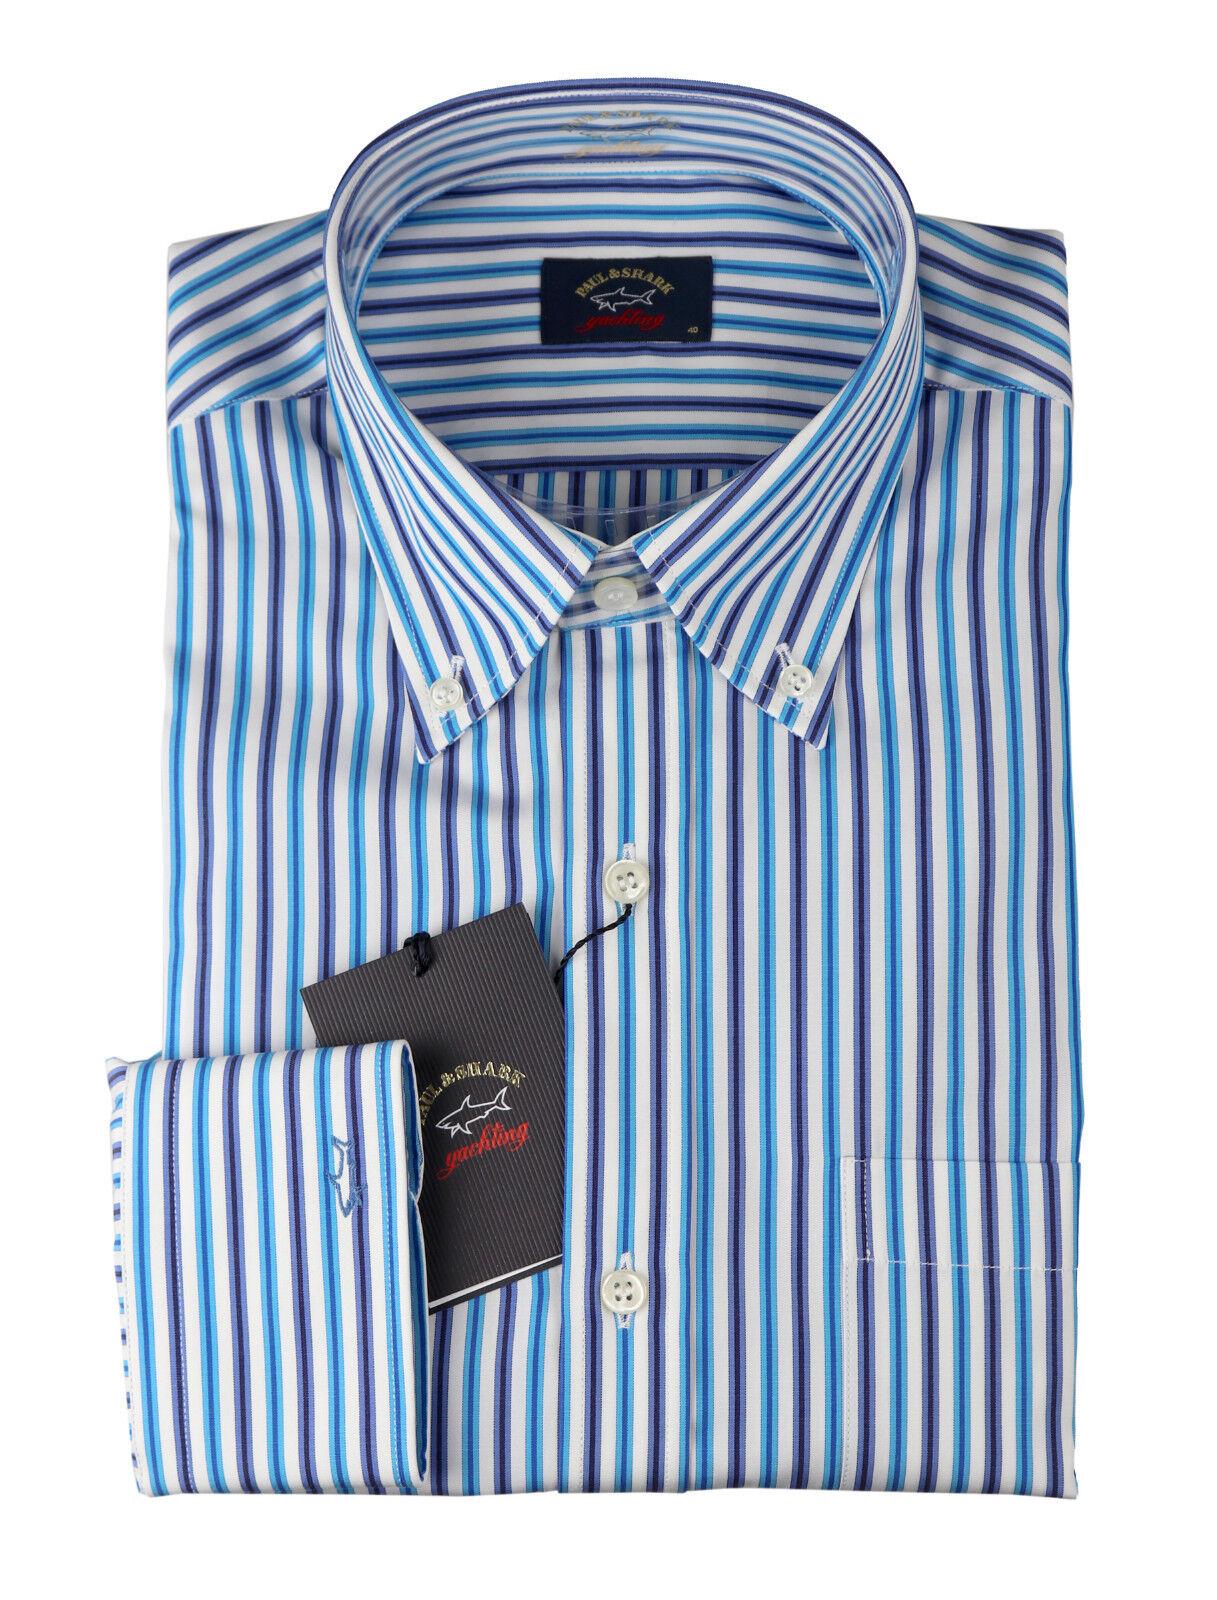 Paul & Shark Herren langarm Hemd P18P3138 Baumwolle Streifen Blau Türkis Weiß